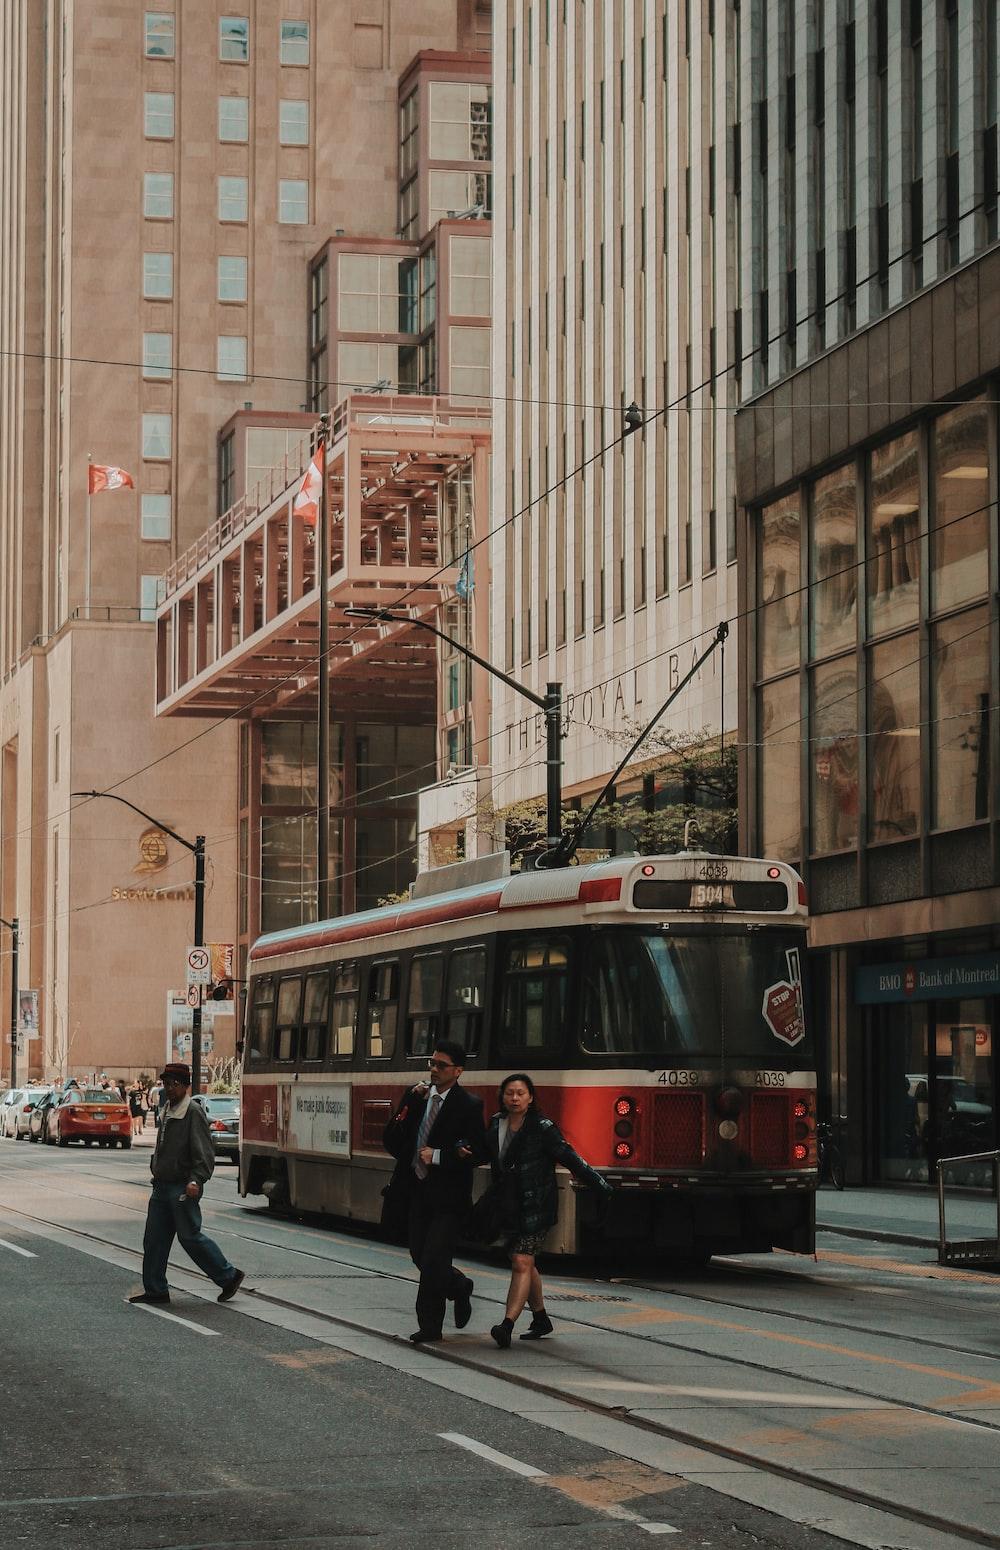 man and woman walking near city tram